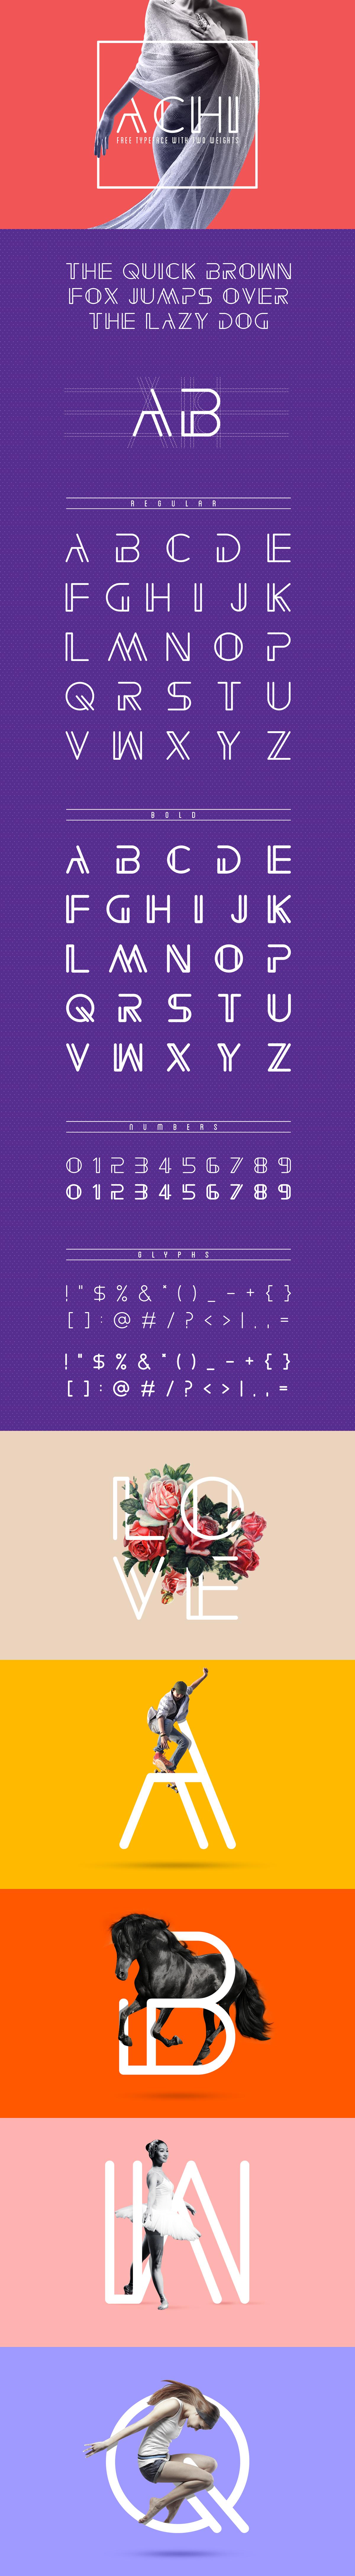 Free font font Typeface free new achi modern type elegant Unique freefont line bold regular font family